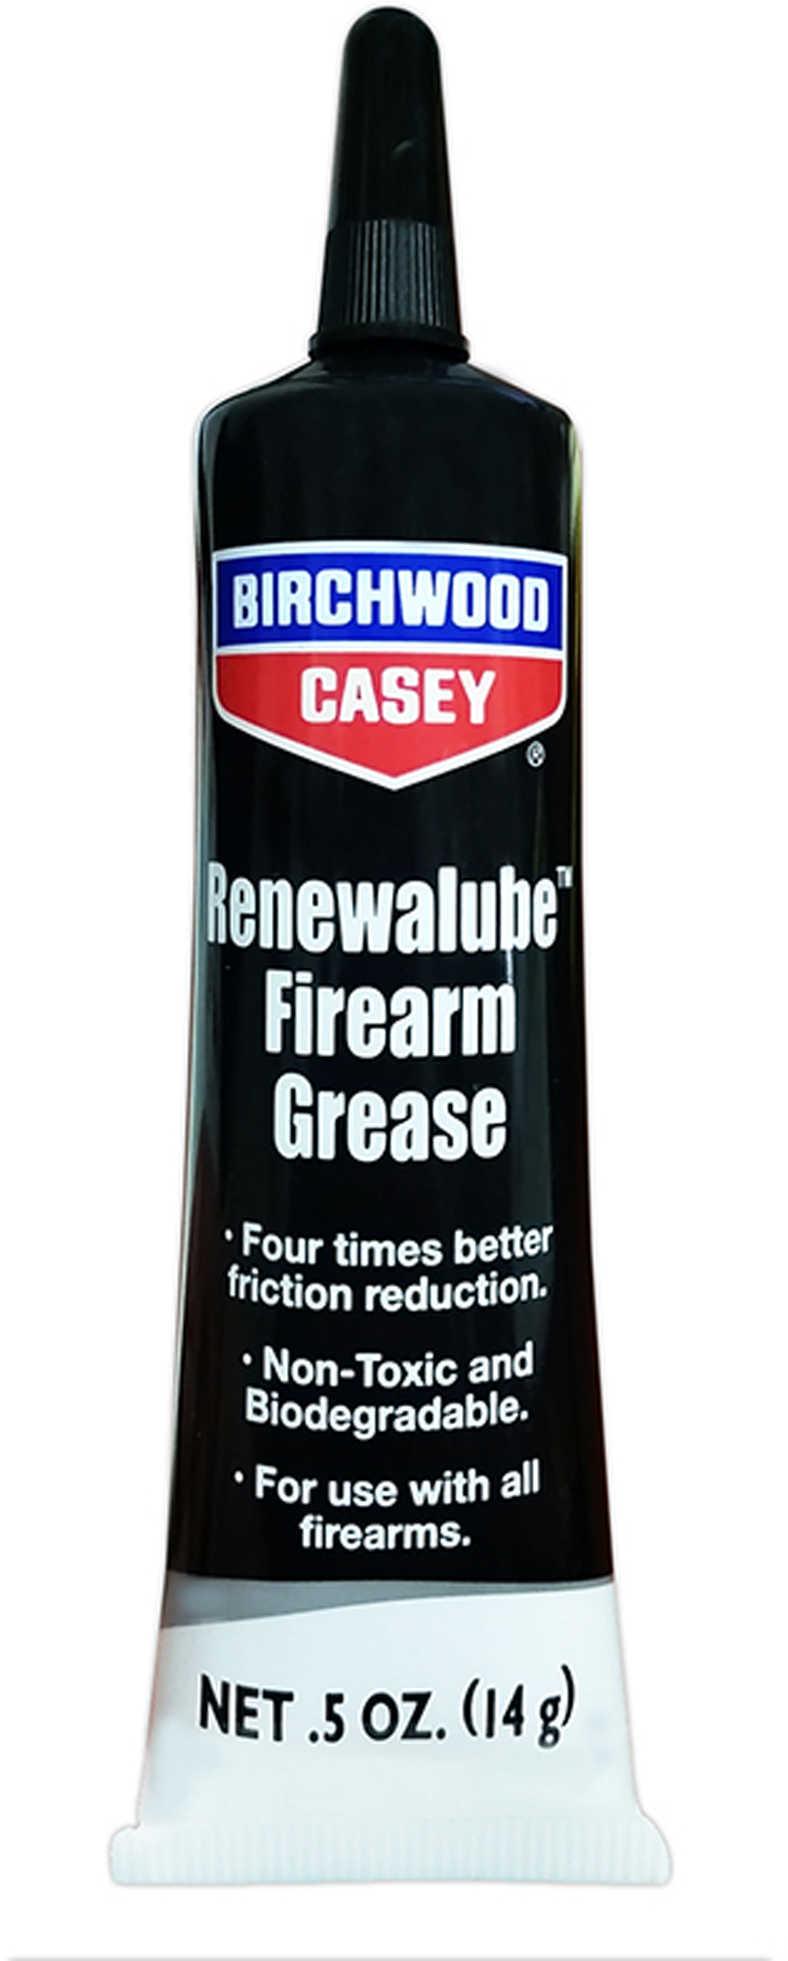 Birchwood Casey Renewalube Bio Firearm Grease 0.50 Oz Tube